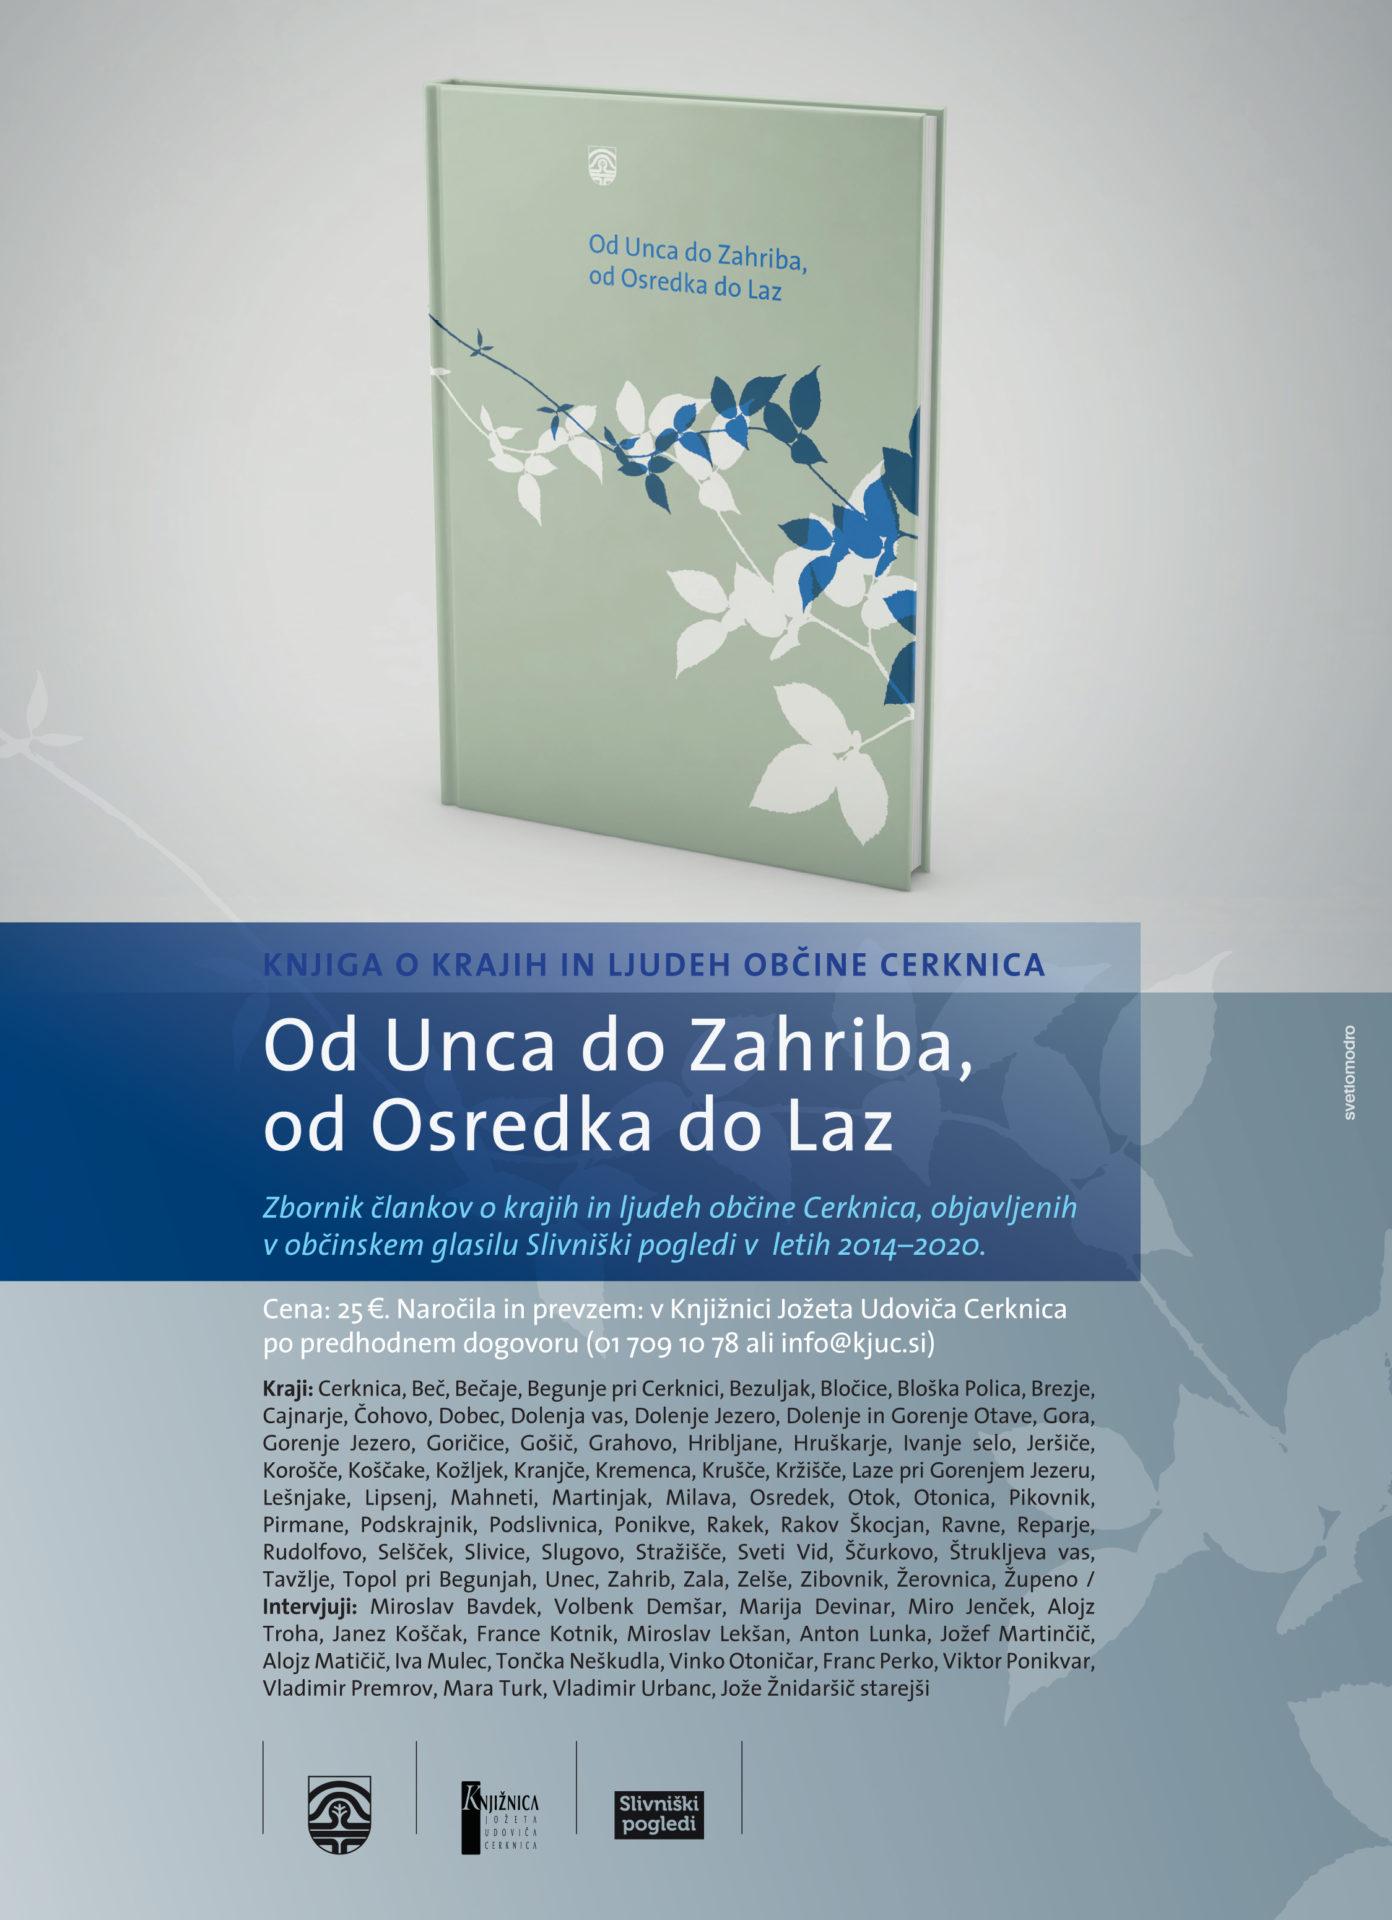 januar oglas - Od Unca do Zahriba, od Osredka do Laz – predstavitveni film